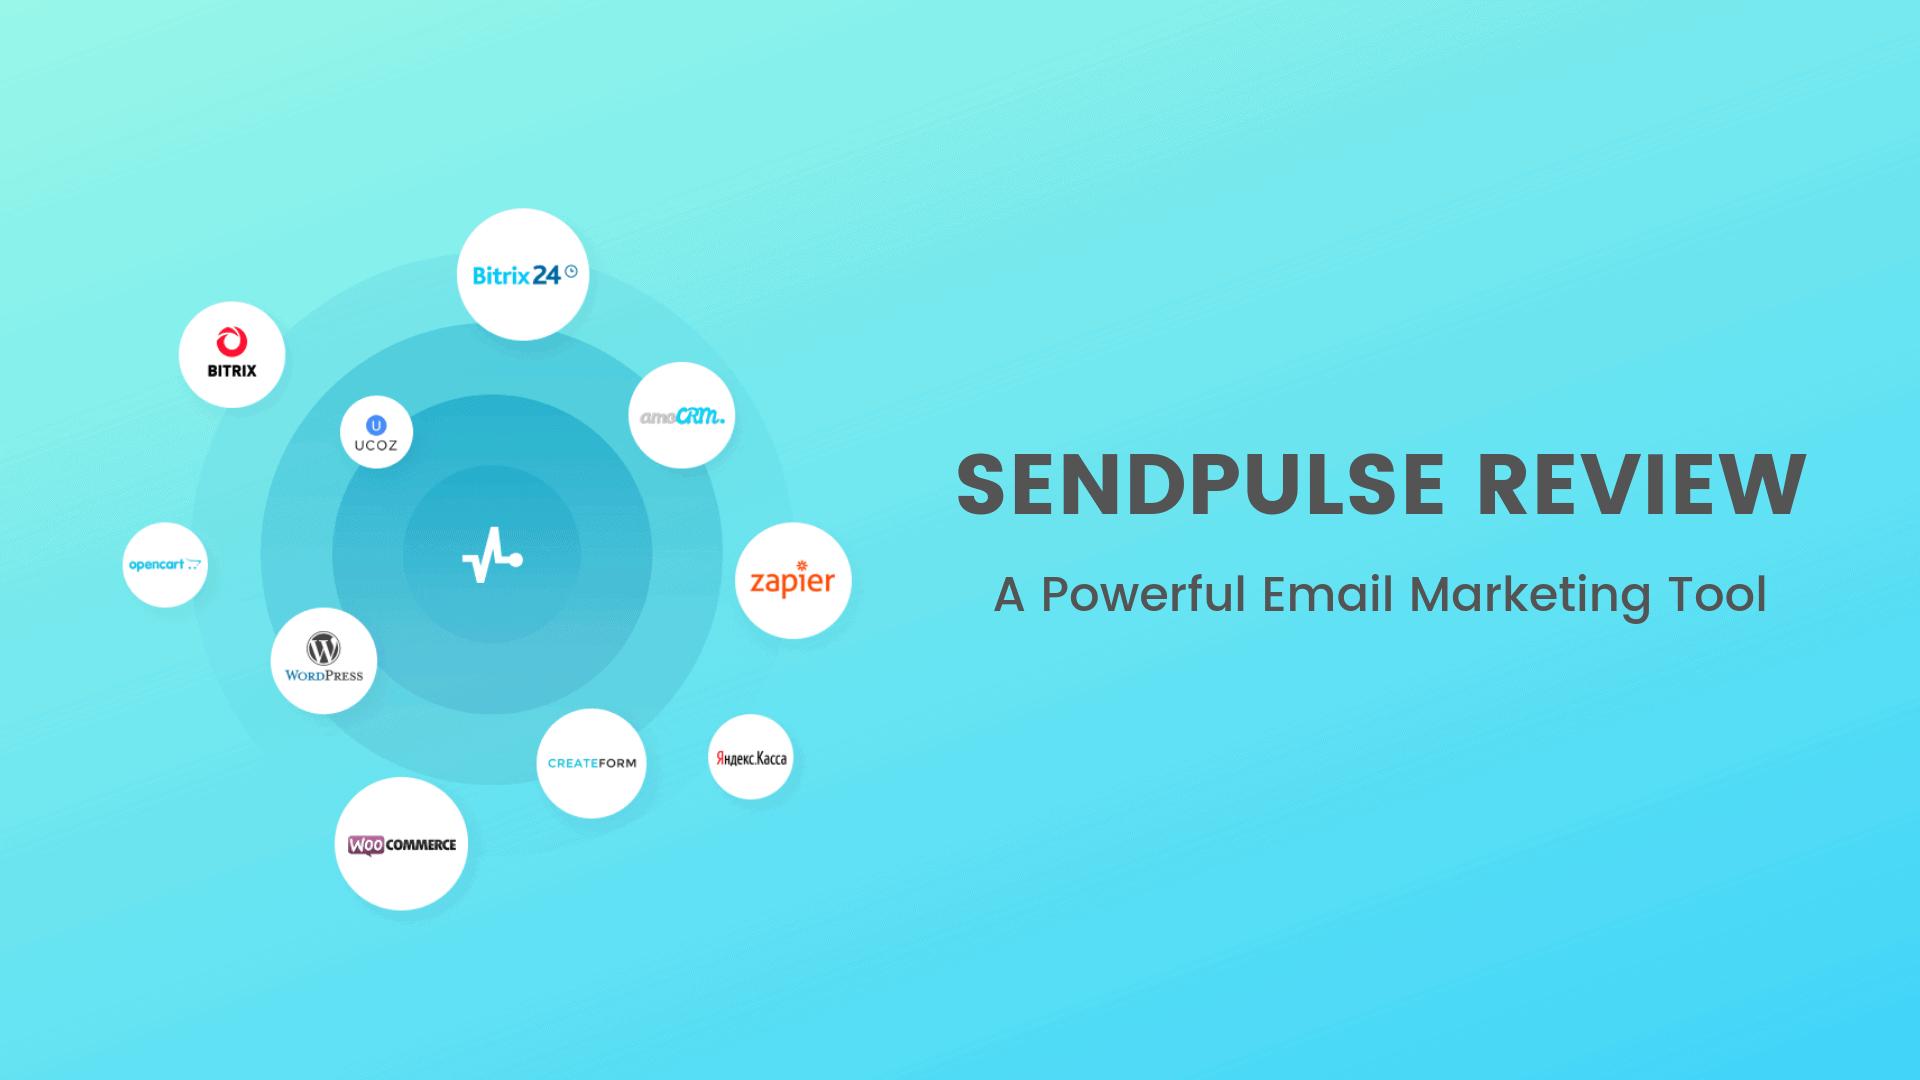 SendPulse Review 2019